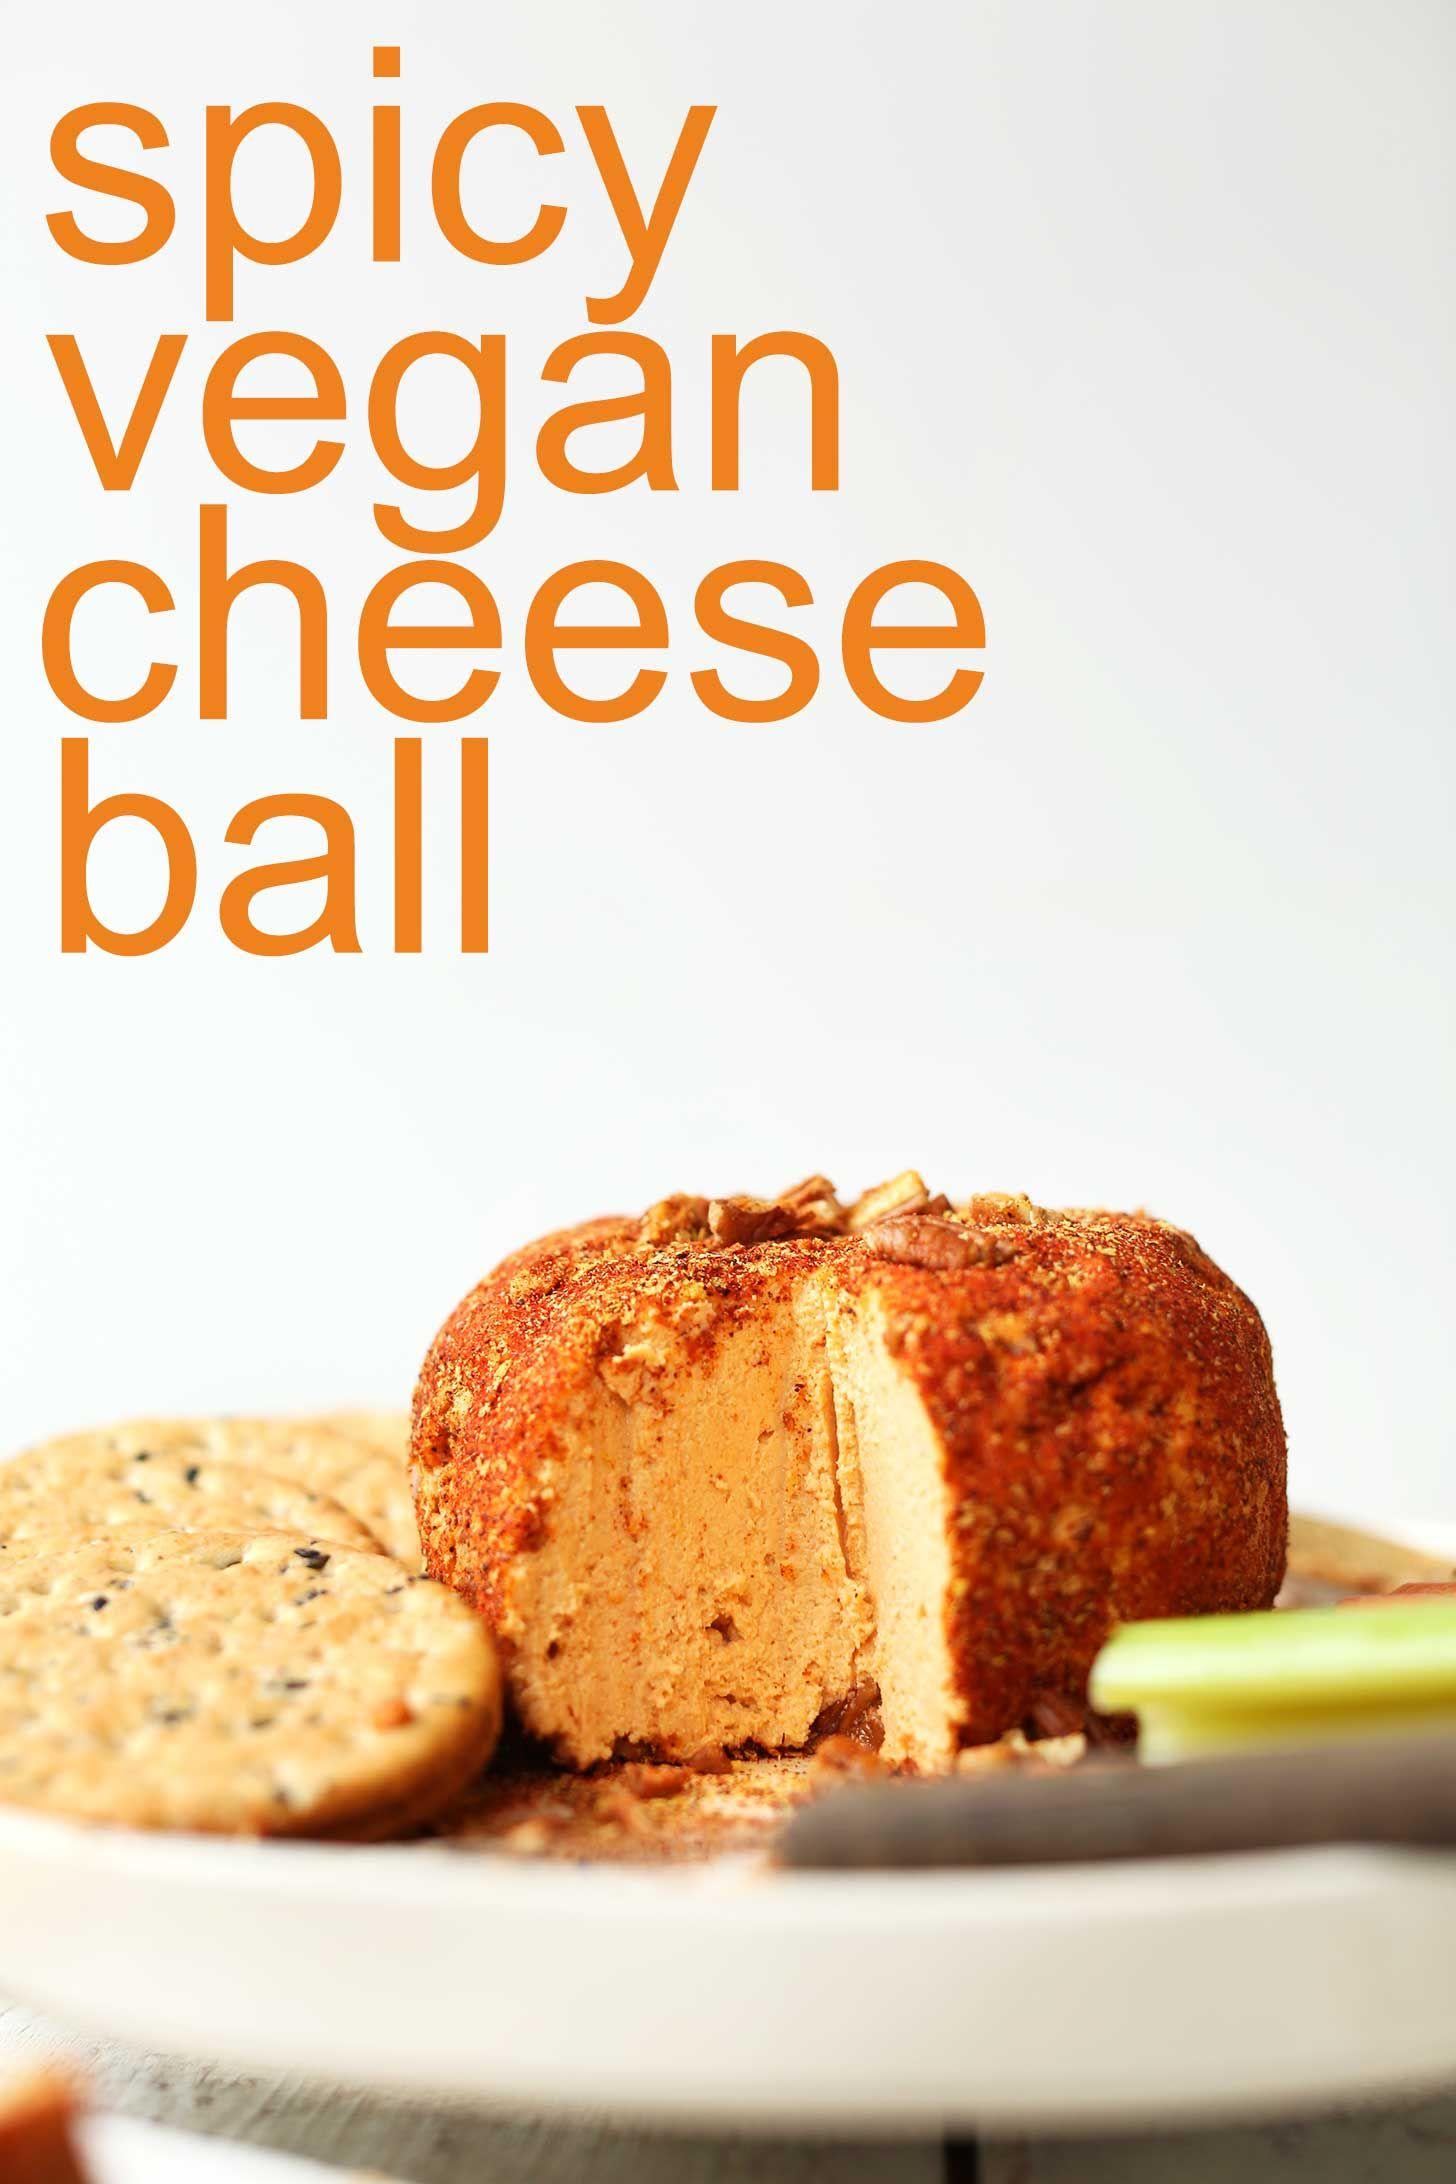 Spicy Vegan Cheese Ball Minimalist Baker Recipes Recipe Vegan Cheese Recipes Vegan Cheese Recipes